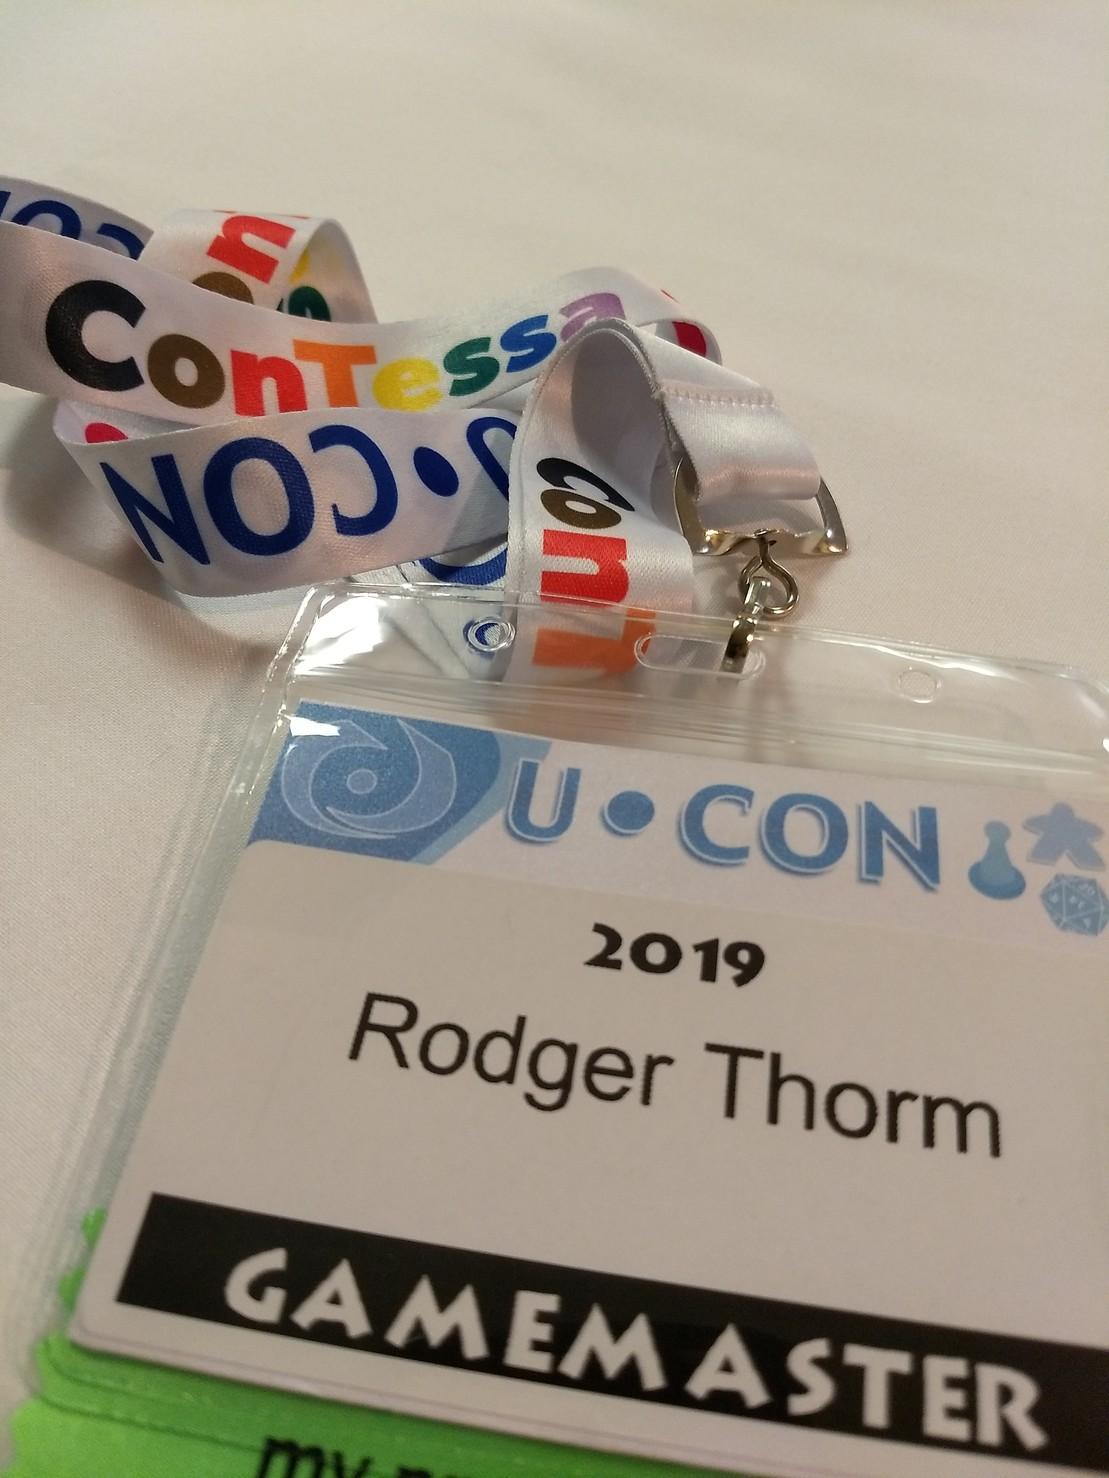 UCon badge